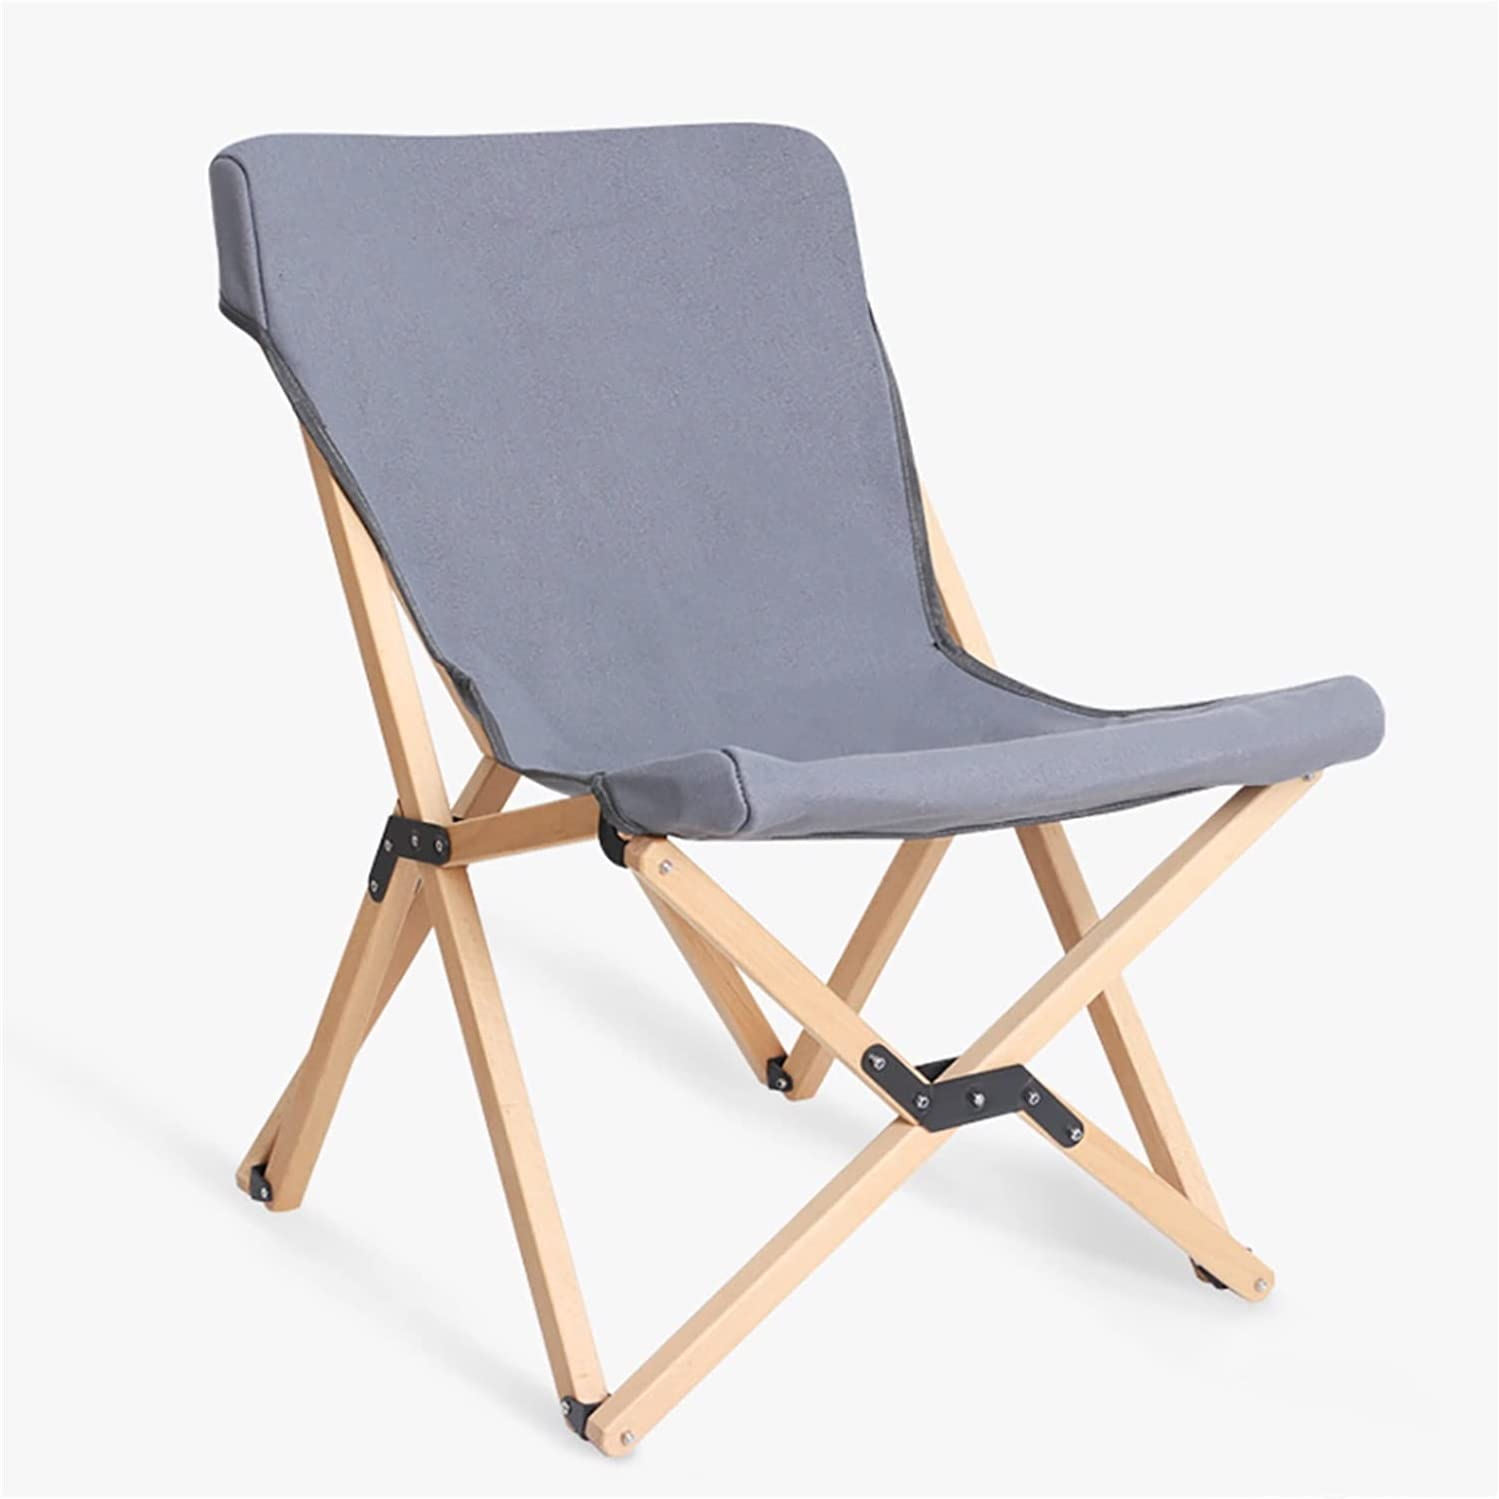 WOYIN Chair Cheap Limited price sale SALE Start Travel Bag Outdoor Ad Beach Portable Patio Folding